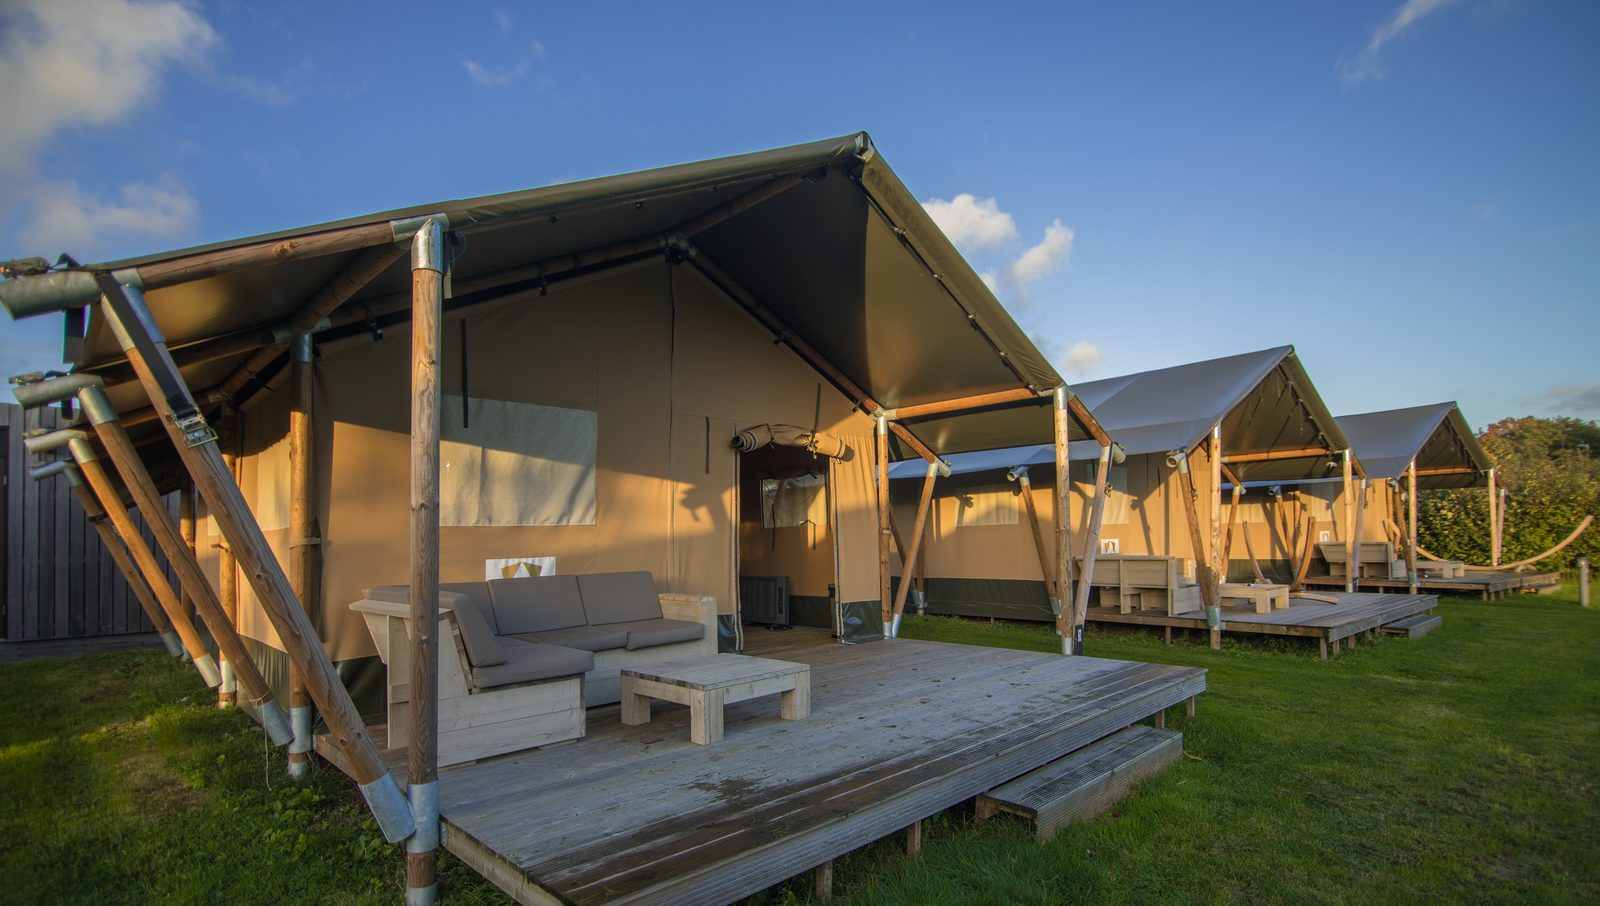 5-star campsite